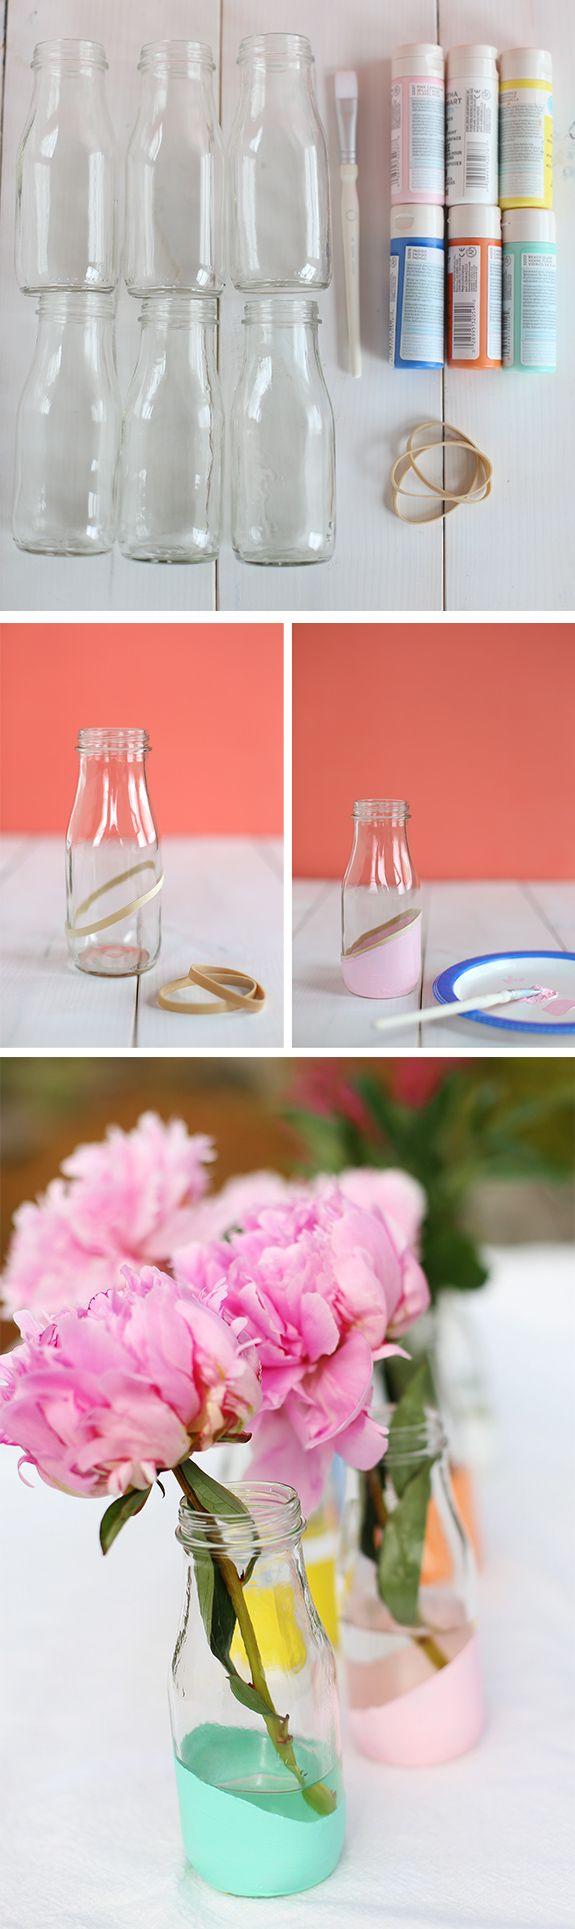 DIY: pastel dipped milk bottle vases